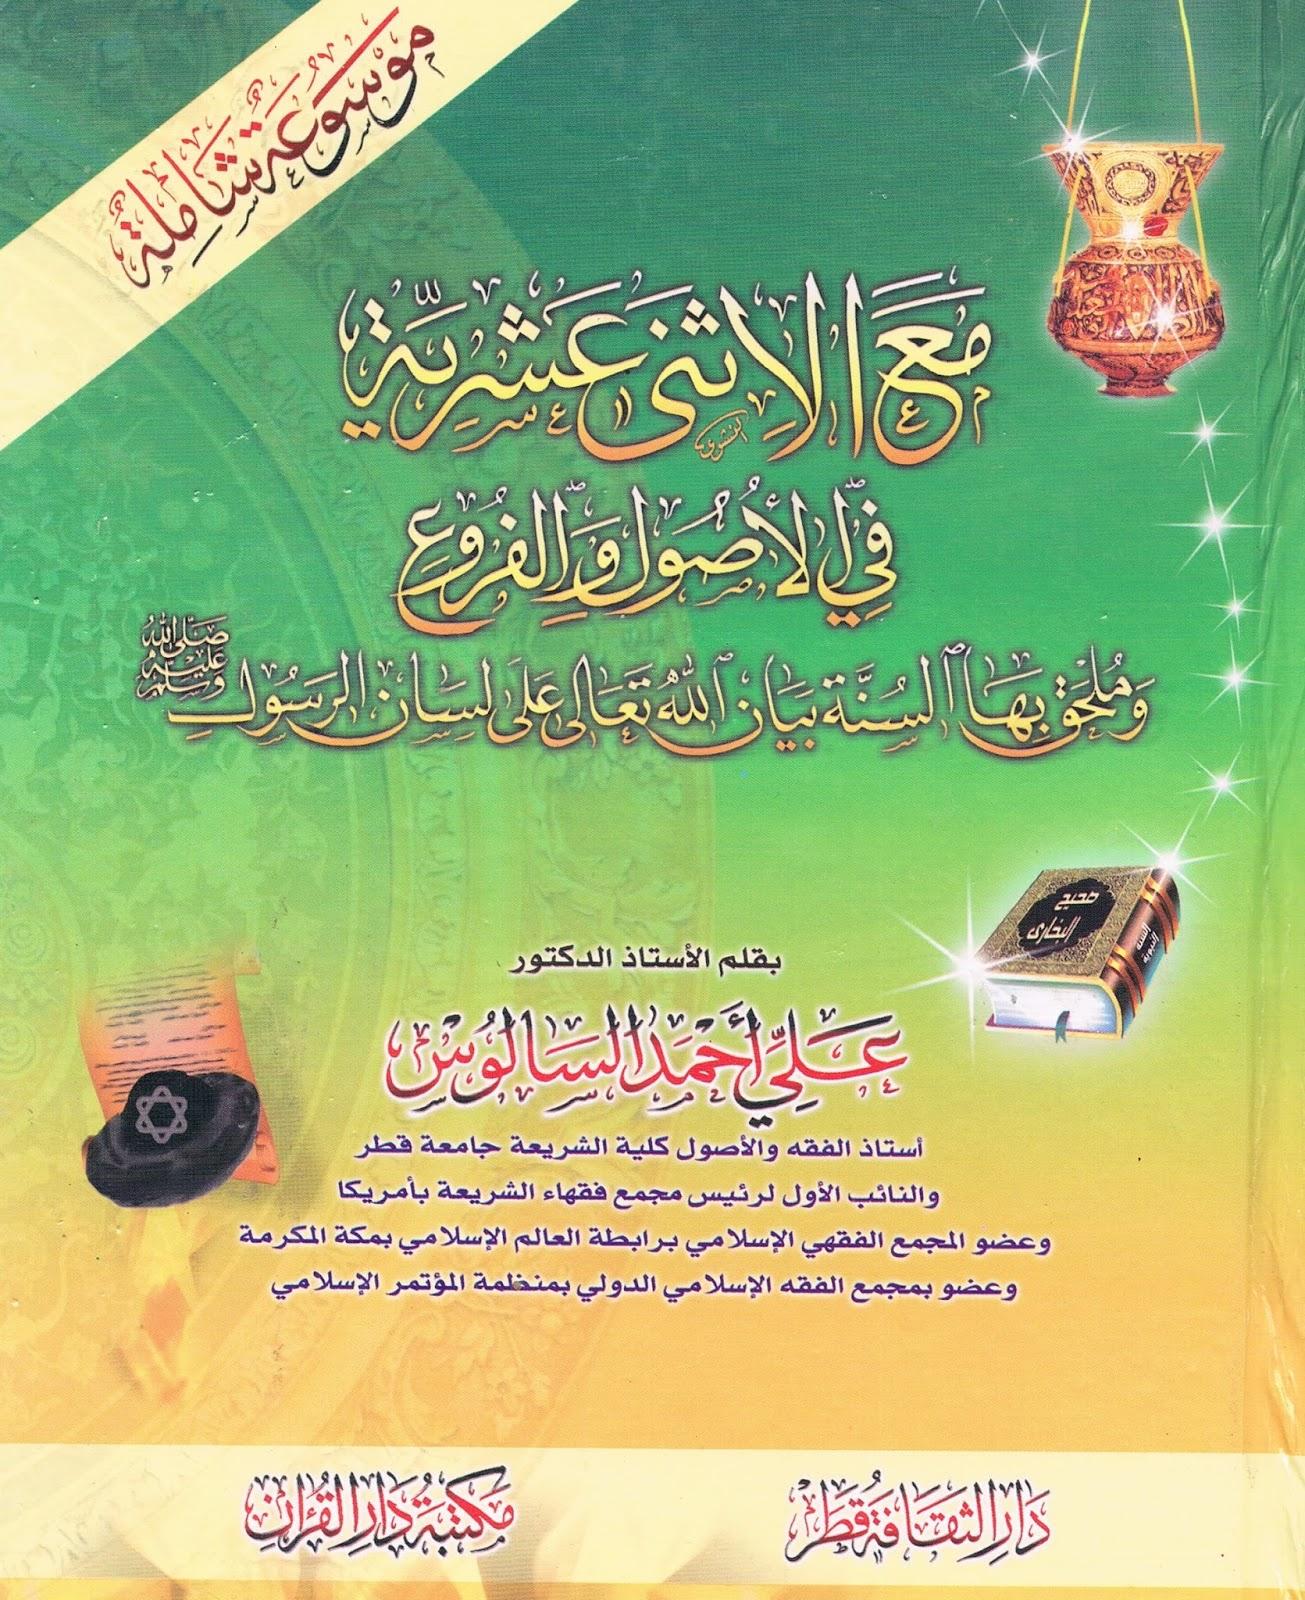 Kuliah, Tazkirah & khutbah Ramadhan 1434H; Rahsia Orang Yang Mencintai